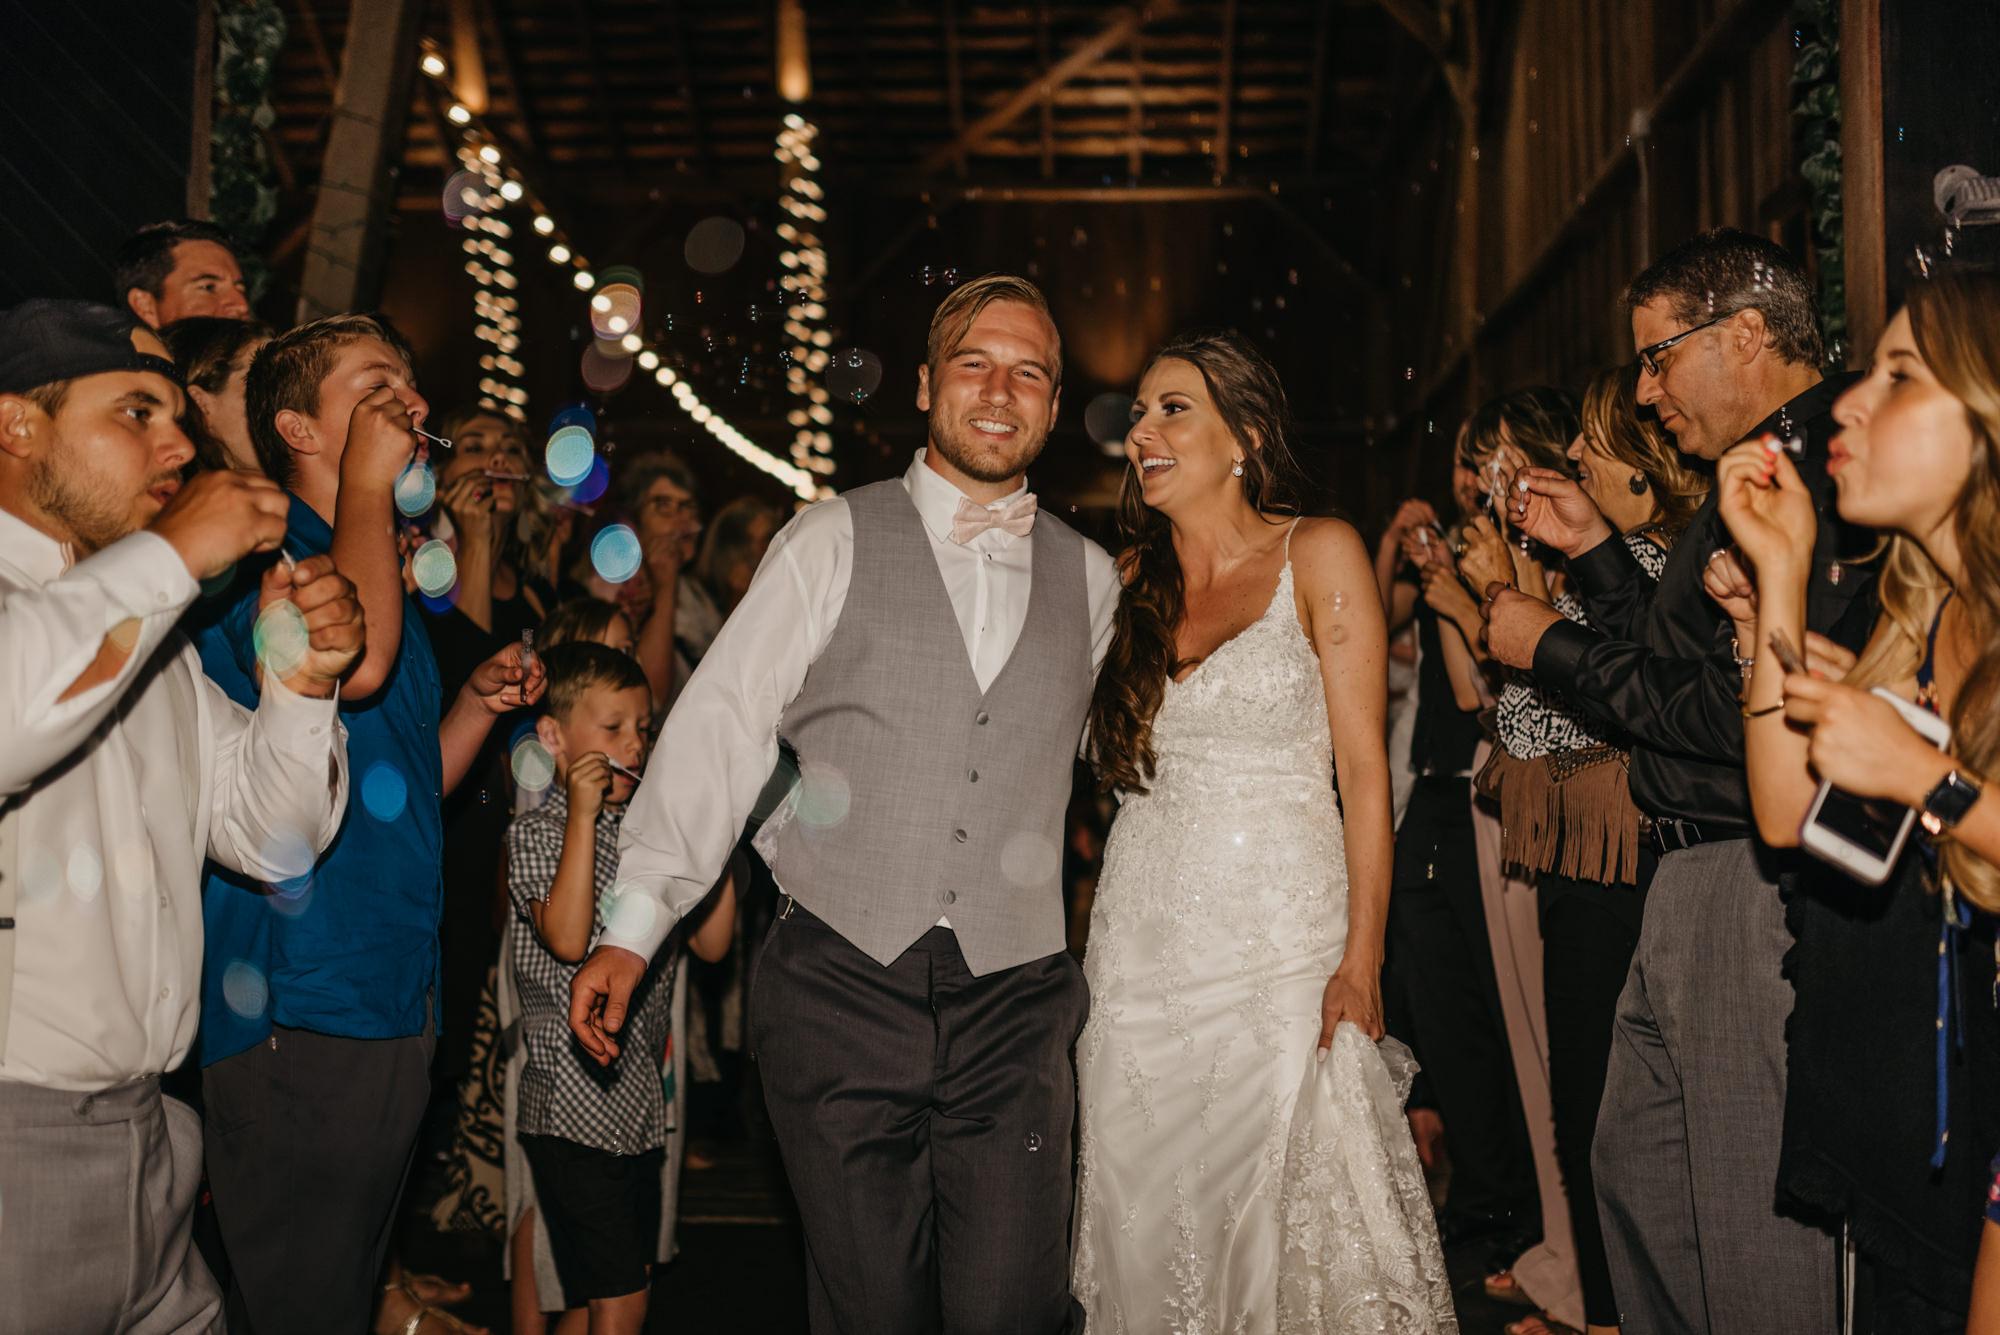 224-portland-northwest-wedding-bubble-exit-barn-string-lights.jpg